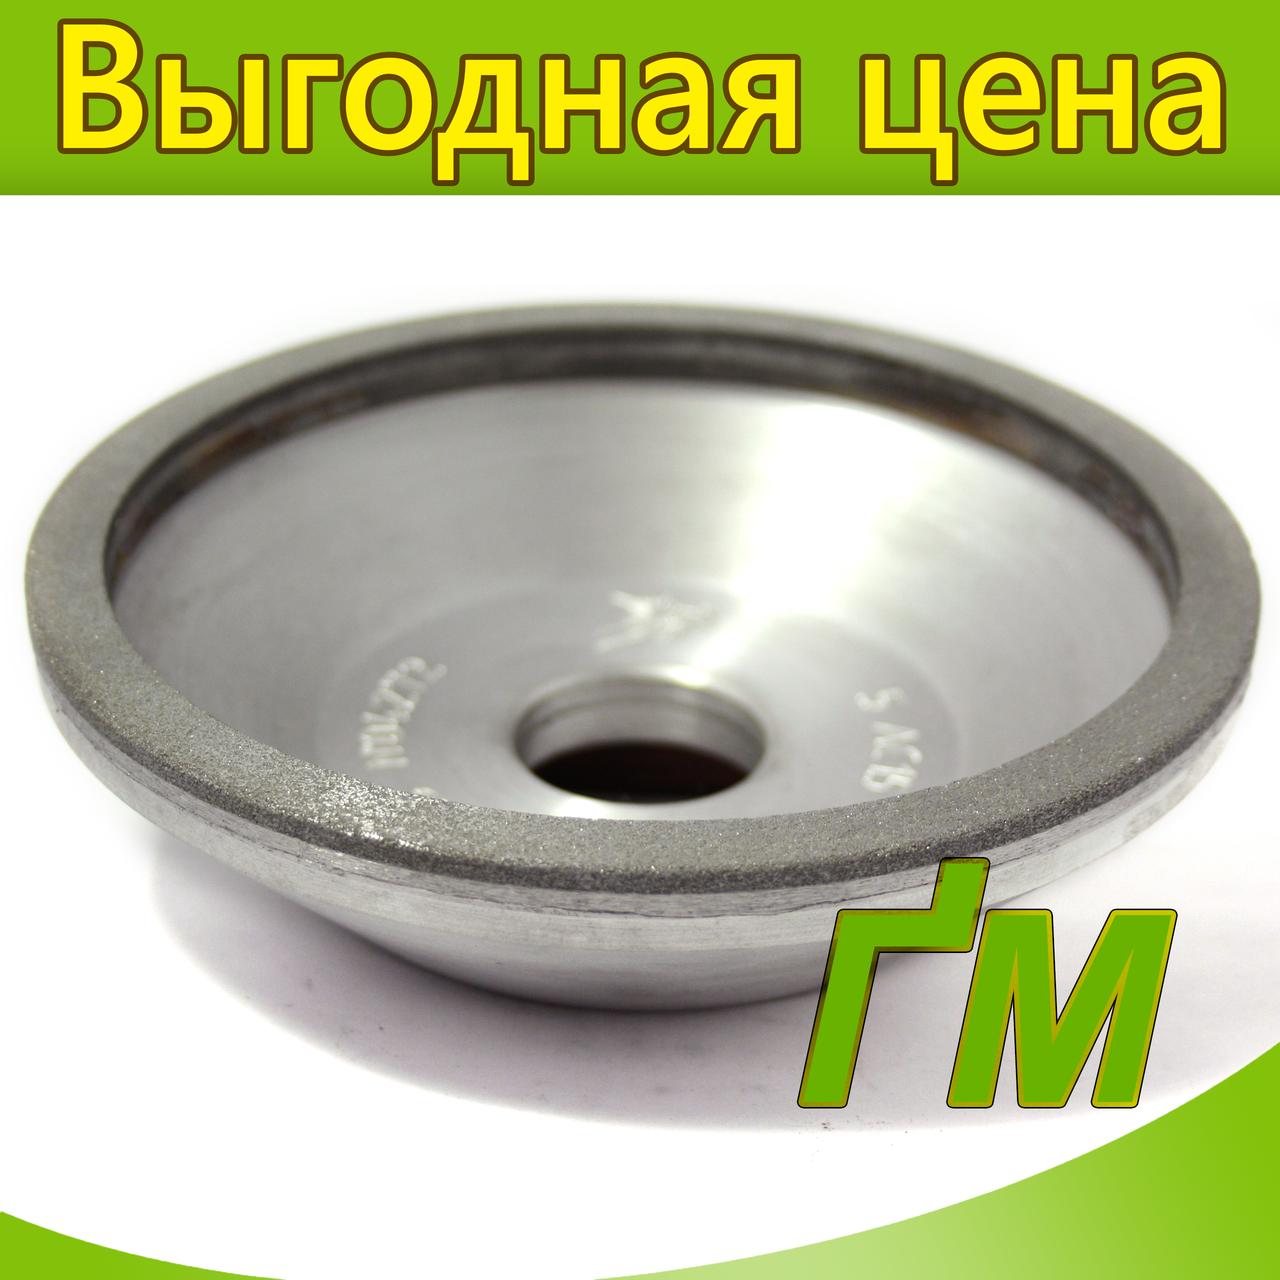 Круг алмазный чашечный конический 12А2-45 Ф 150х40х10х3х32 АС4 100/80 100% В2-01 58 карат